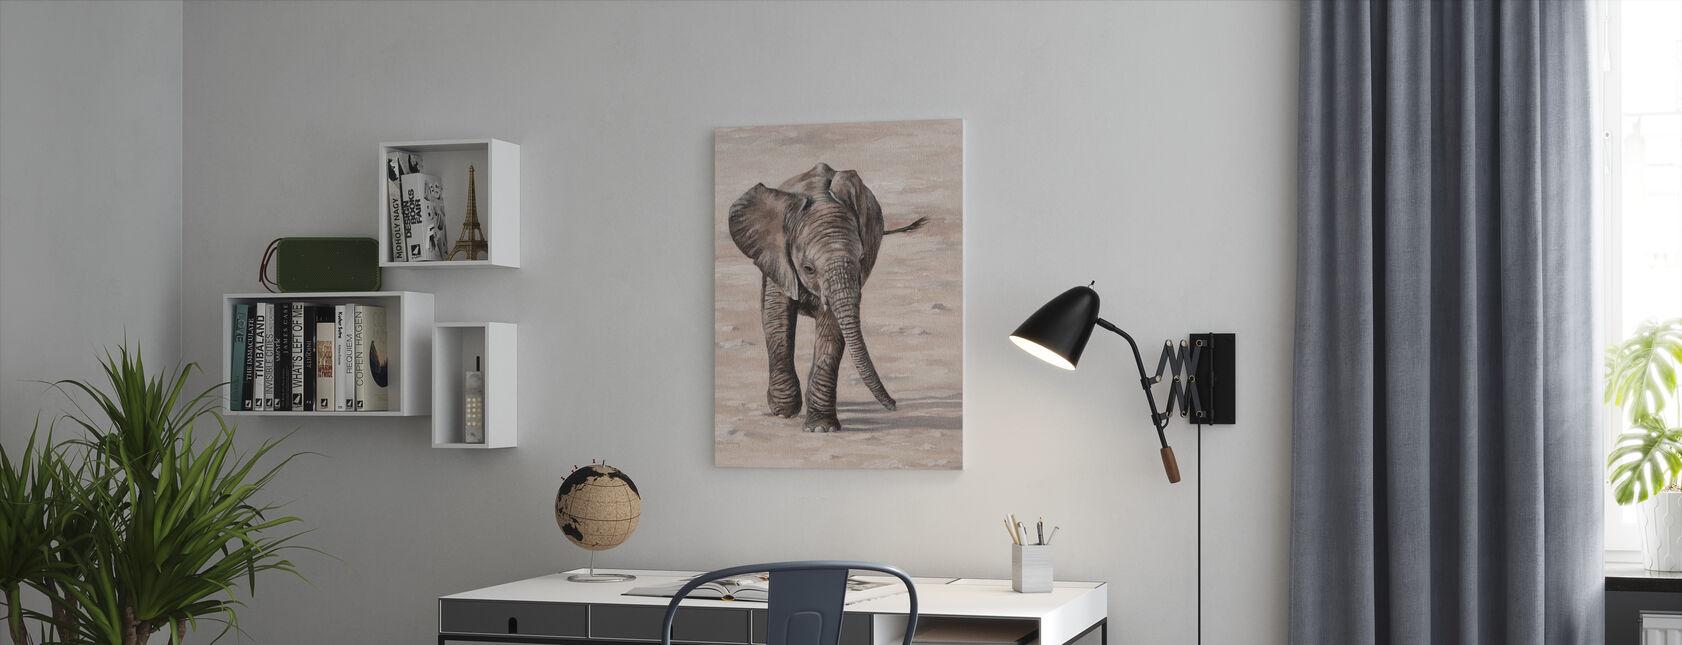 African Elephant Calf - Canvas print - Office